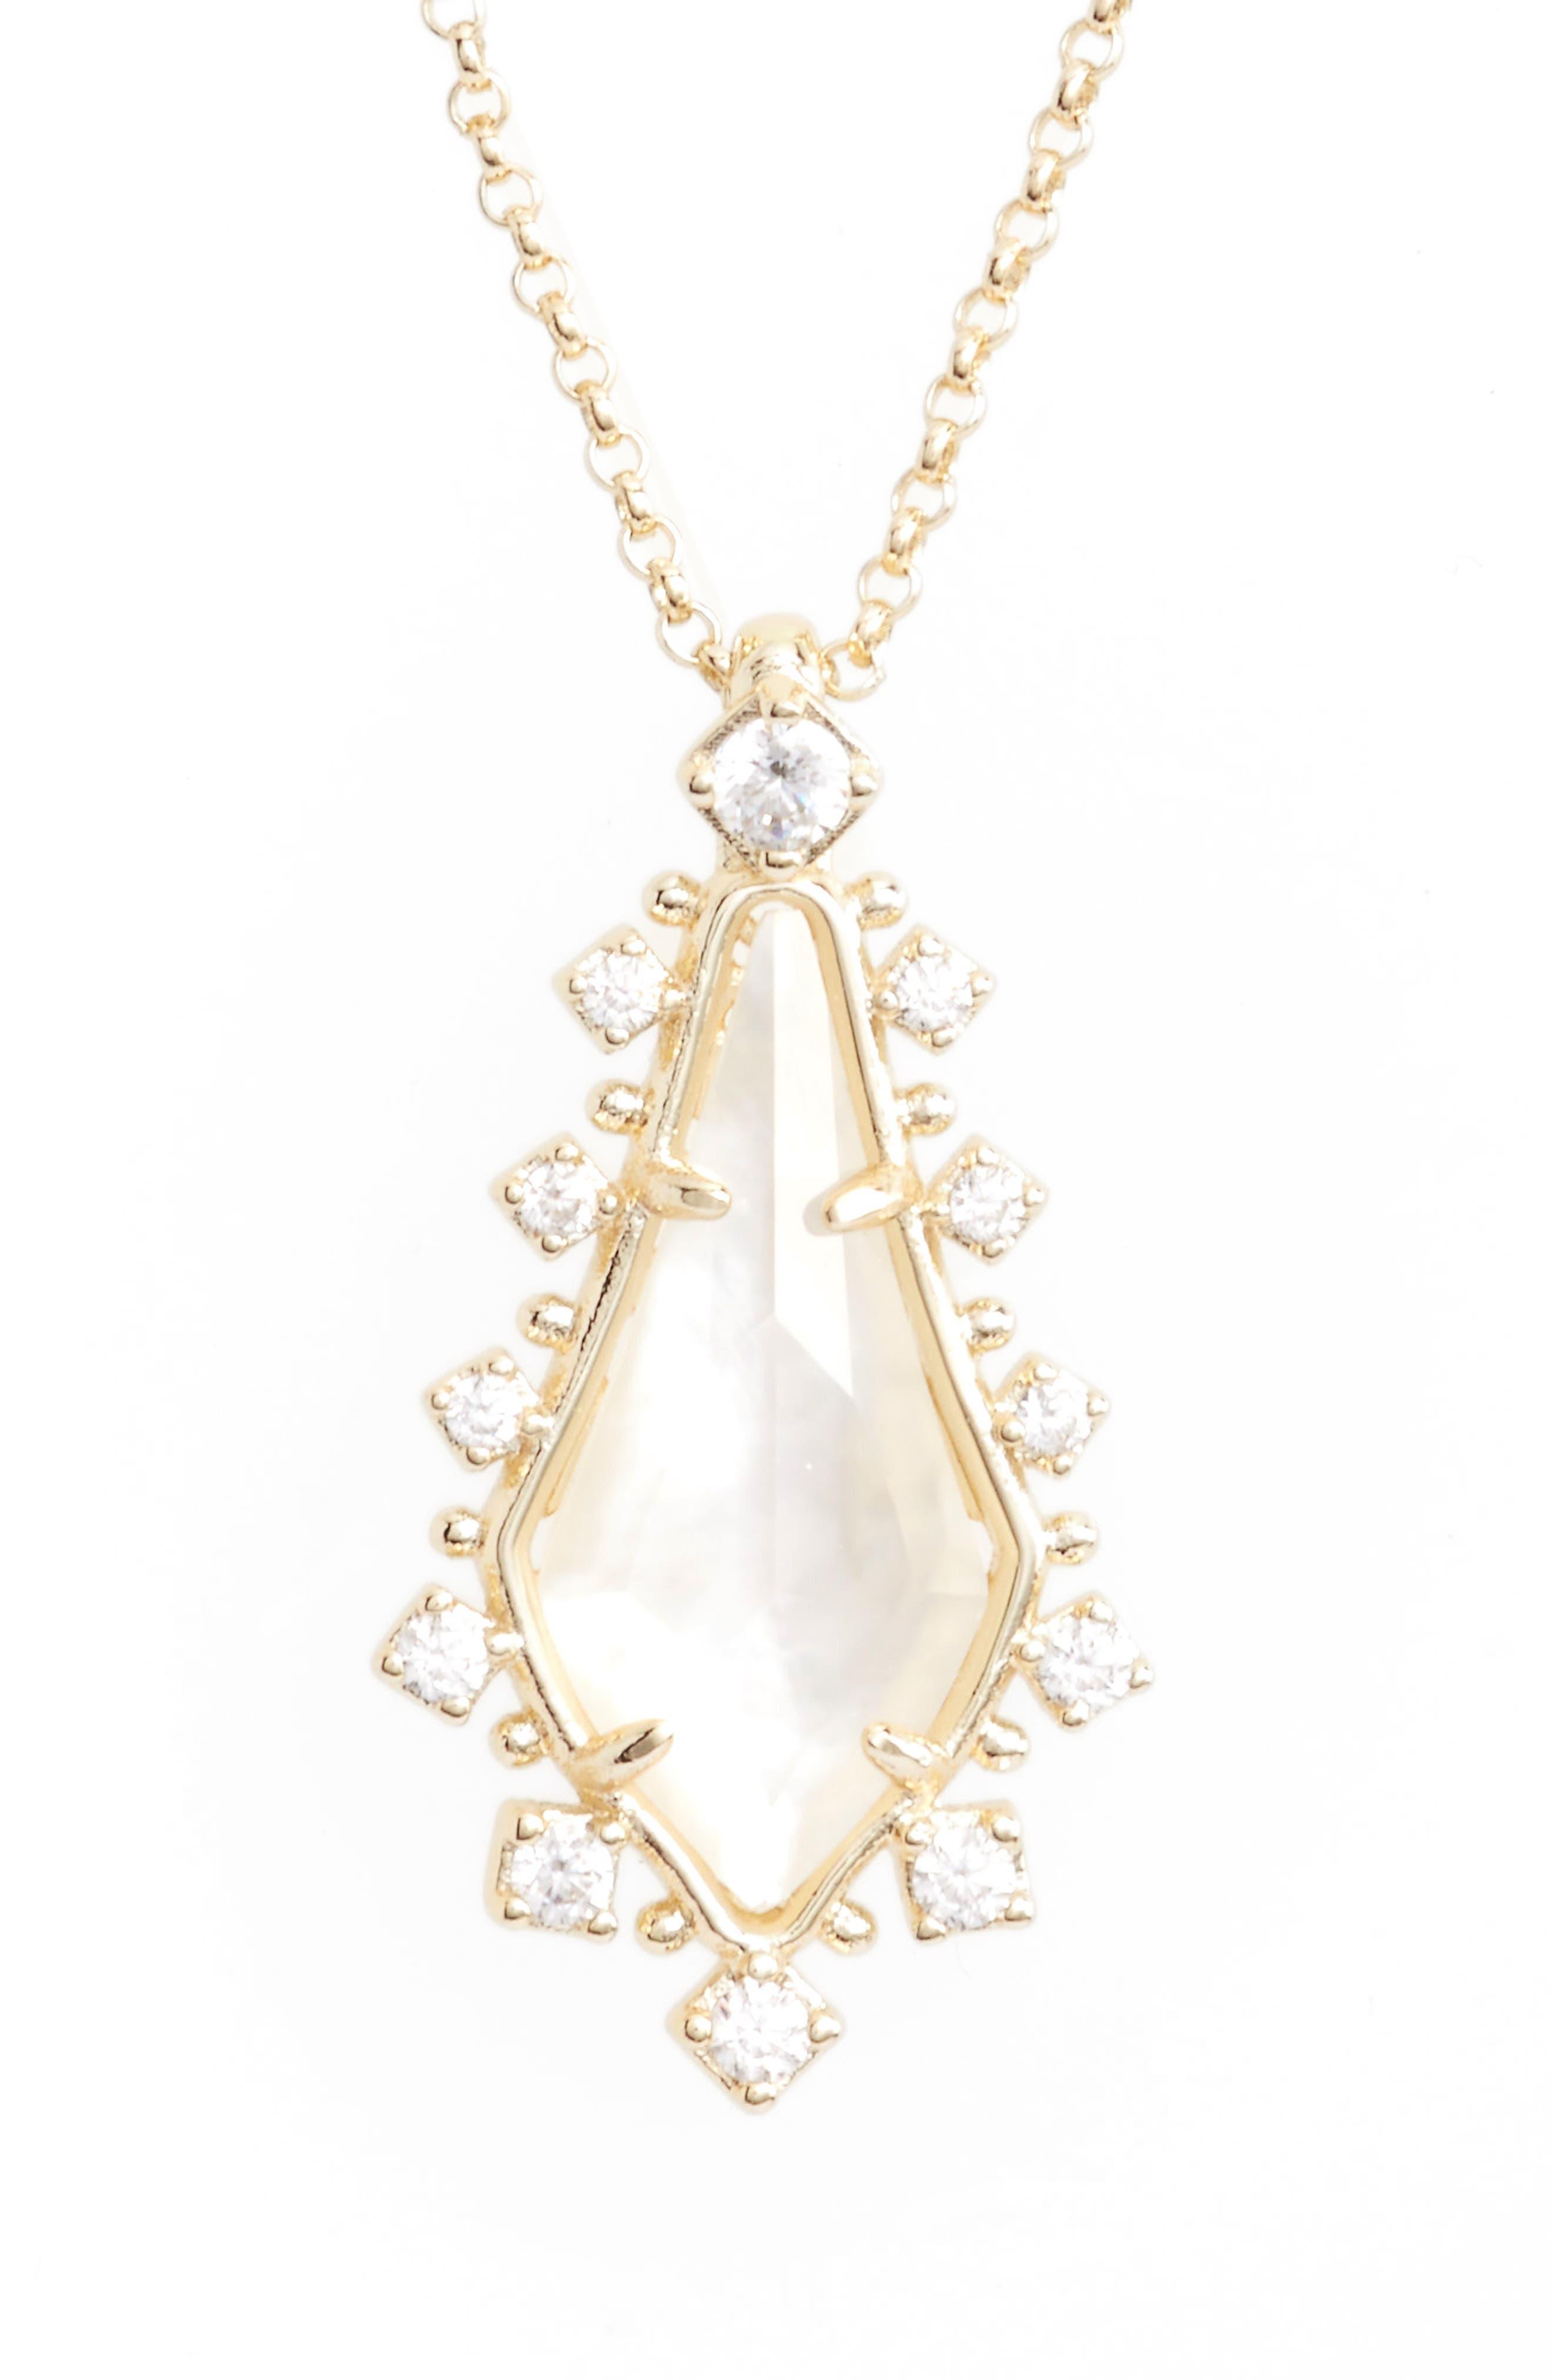 Kendra Scott Shelly Pendant Necklace